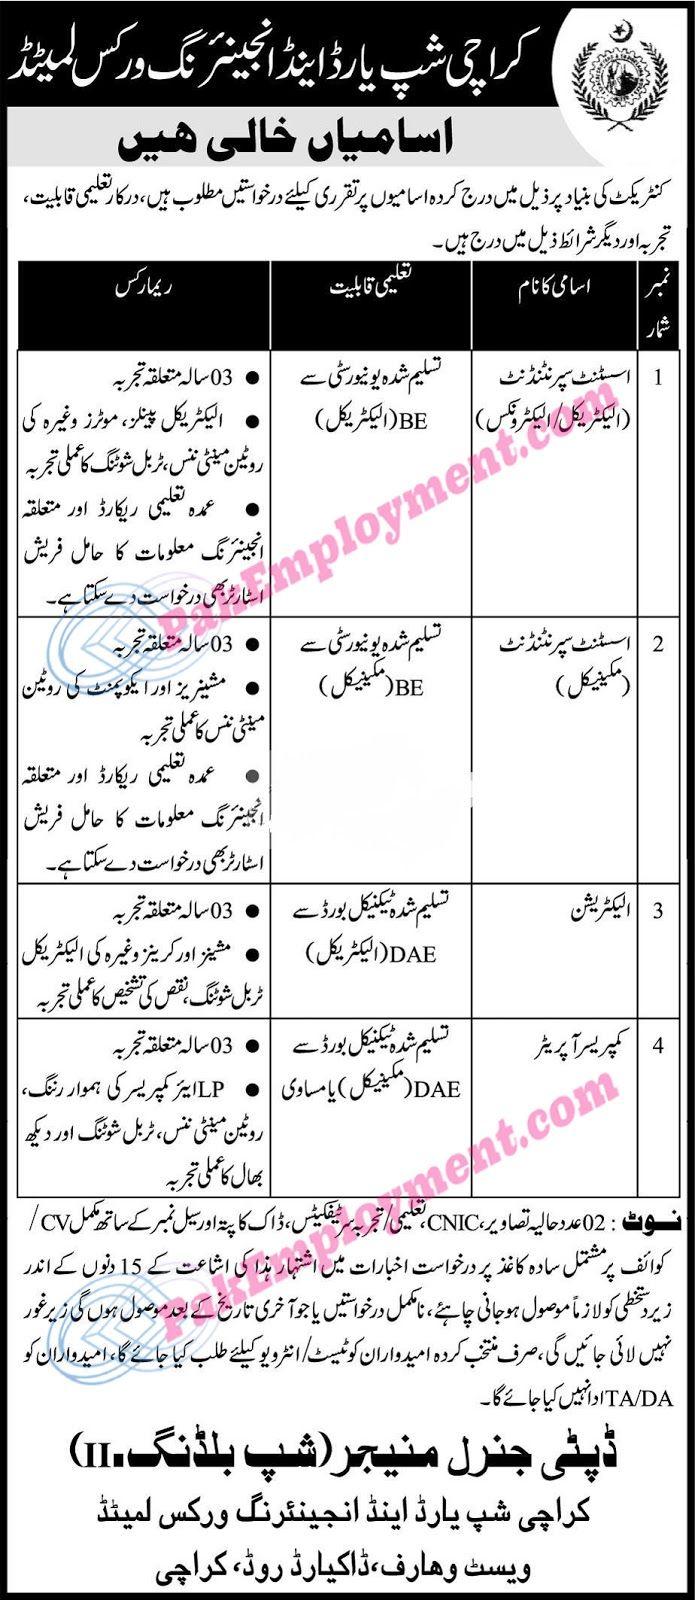 qatar gas company jobs apply online jobs in title of job detail of job of job karachi ship yard company job which province